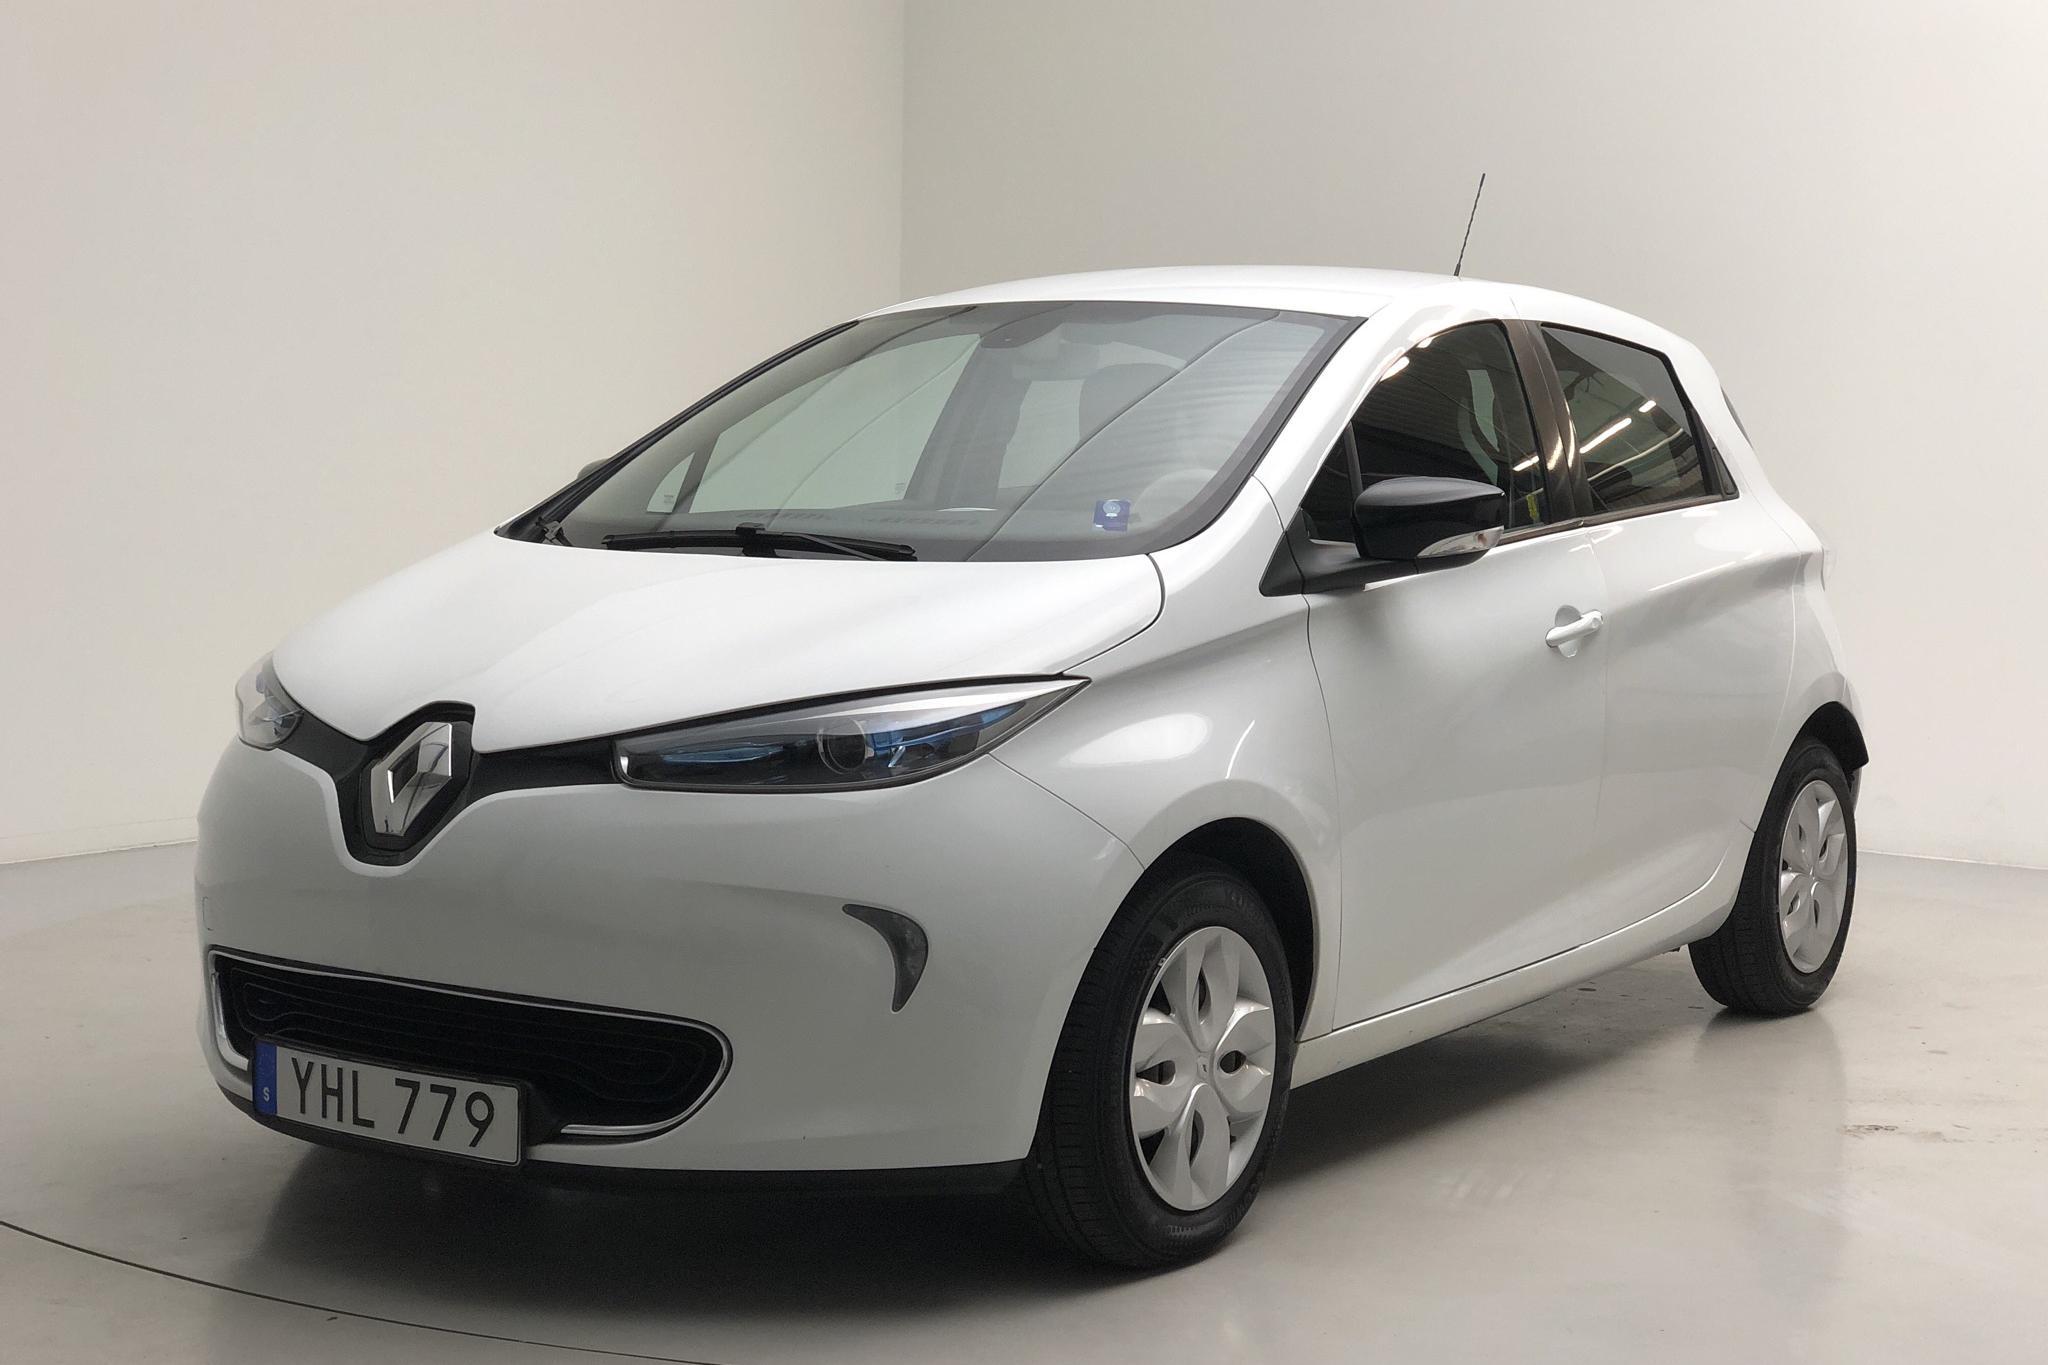 Renault Zoe 22 kWh (88hk) - 85 270 km - Automatic - white - 2017